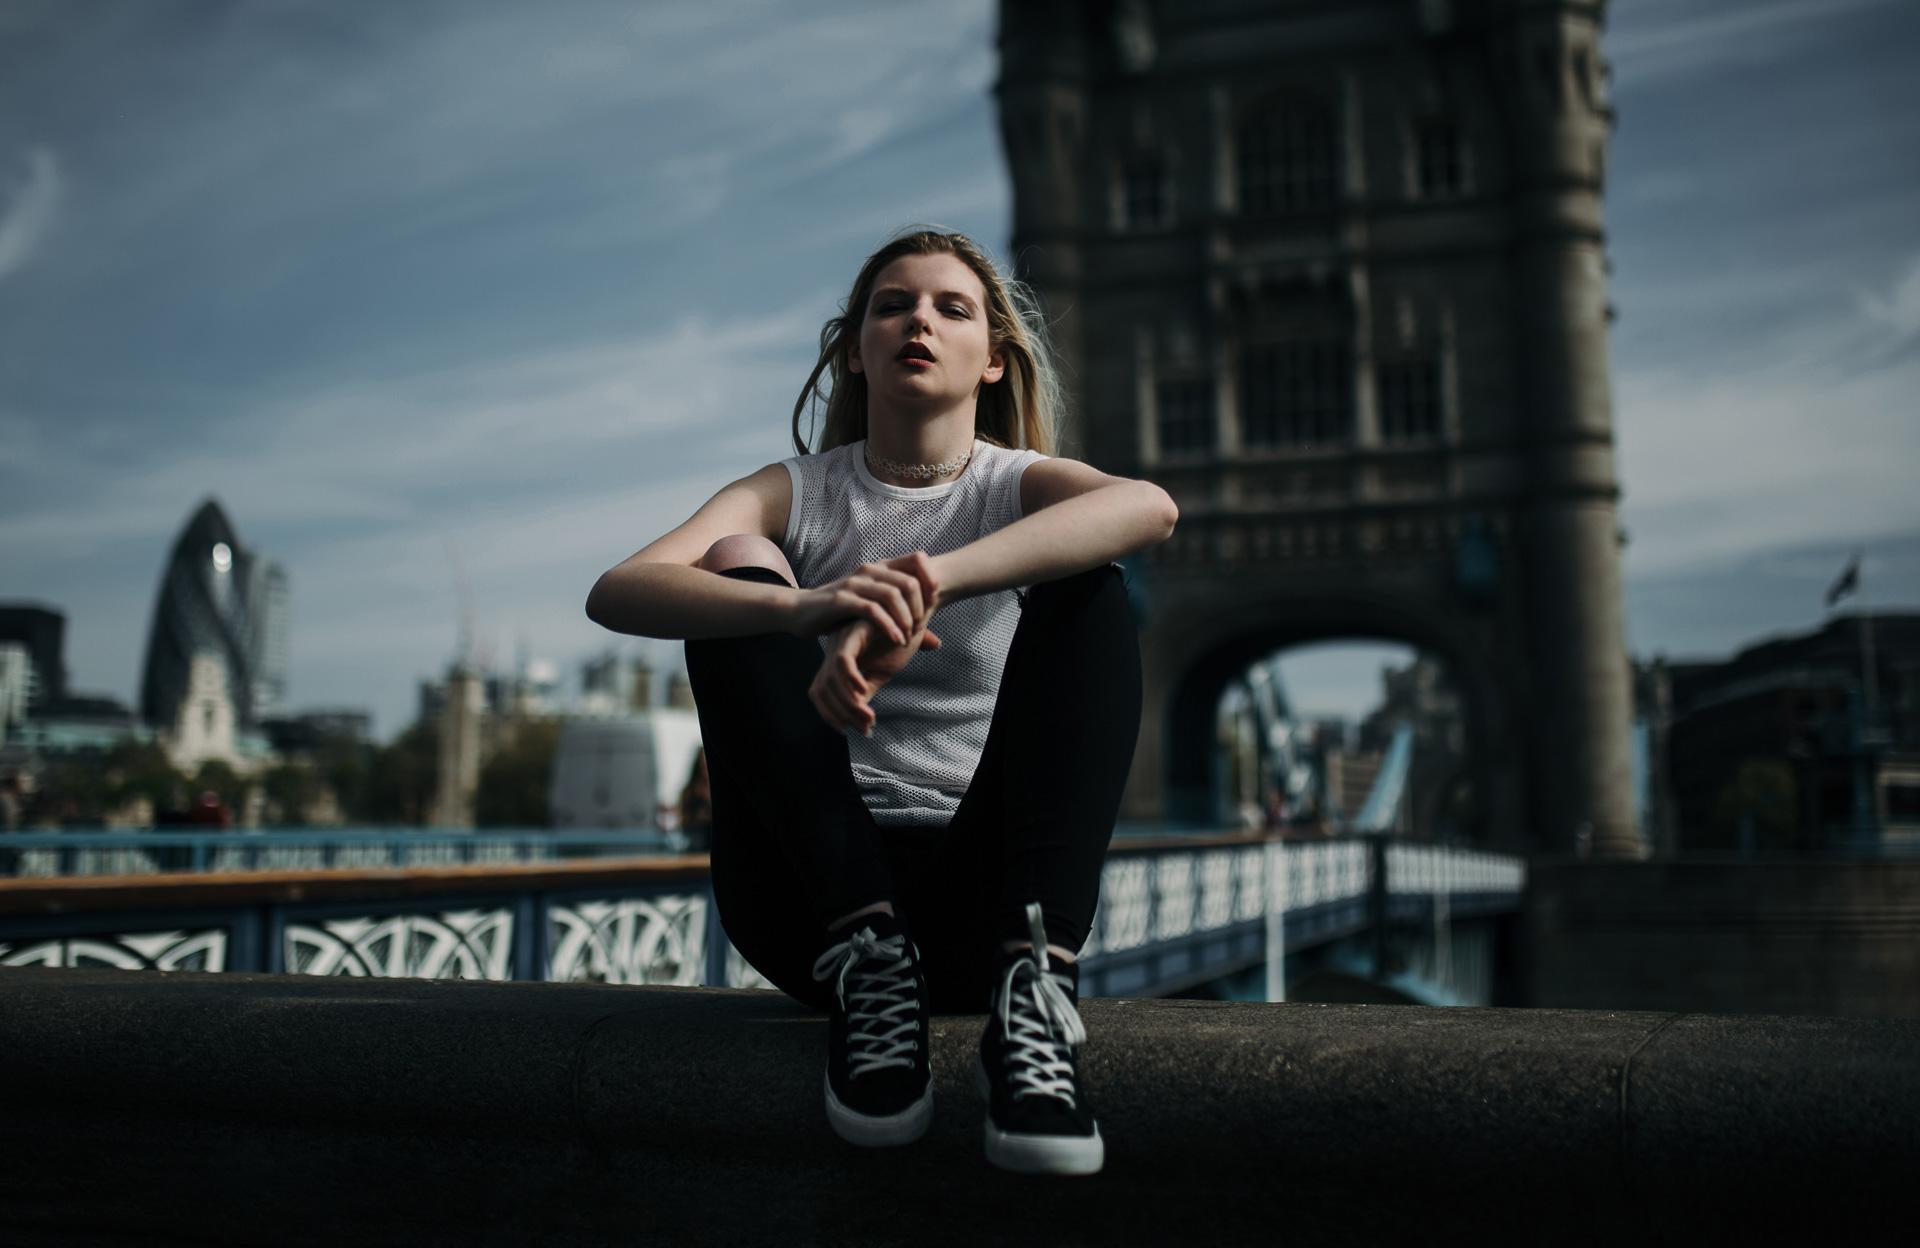 gabor_lenart_fashion_photographer_london_portrait_model_agency_img_5176